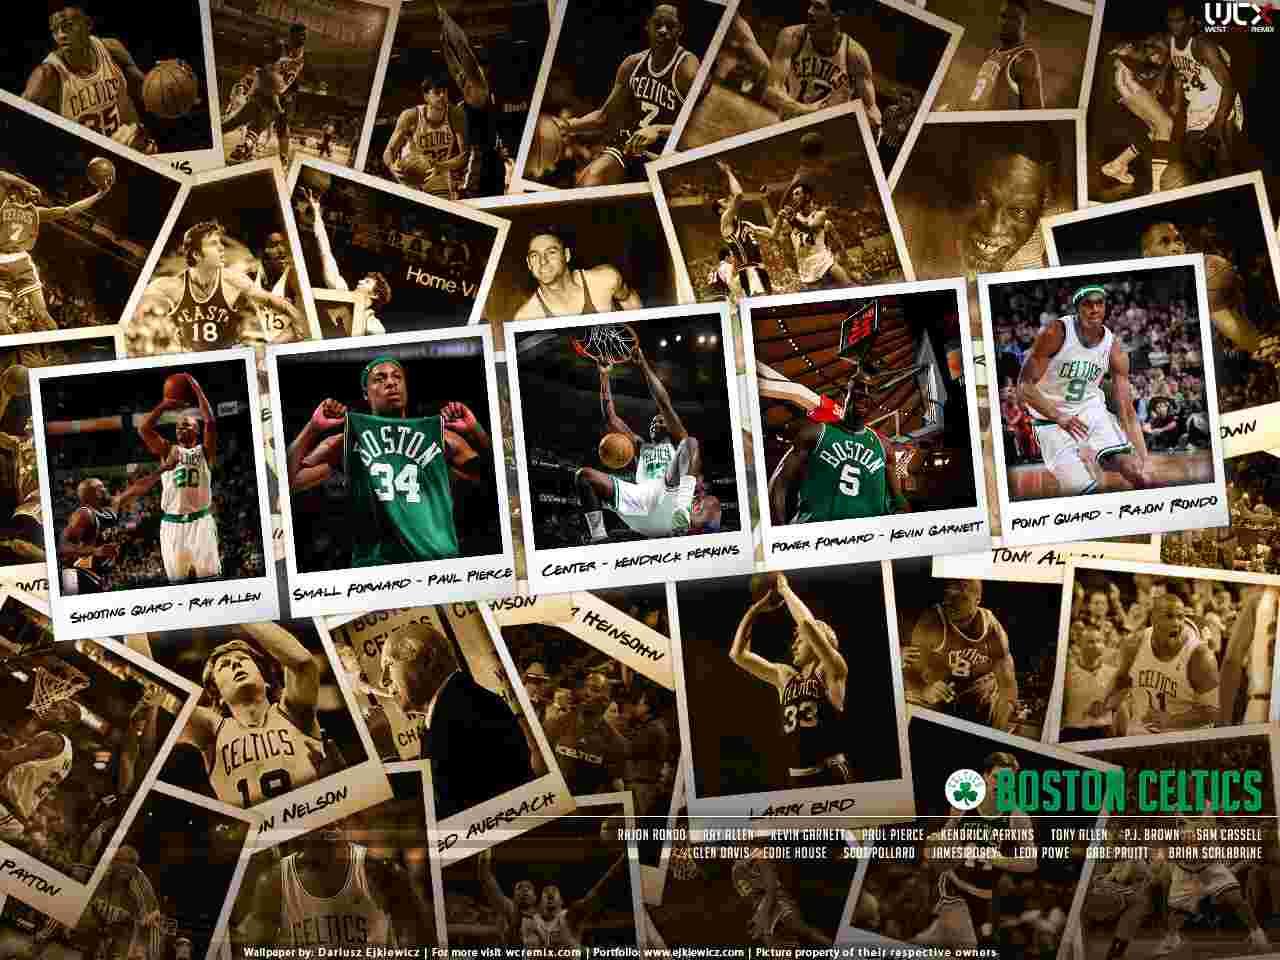 Boston Celtics 2008 Polaroid wallpaper   Basketball   Sport 1280x960